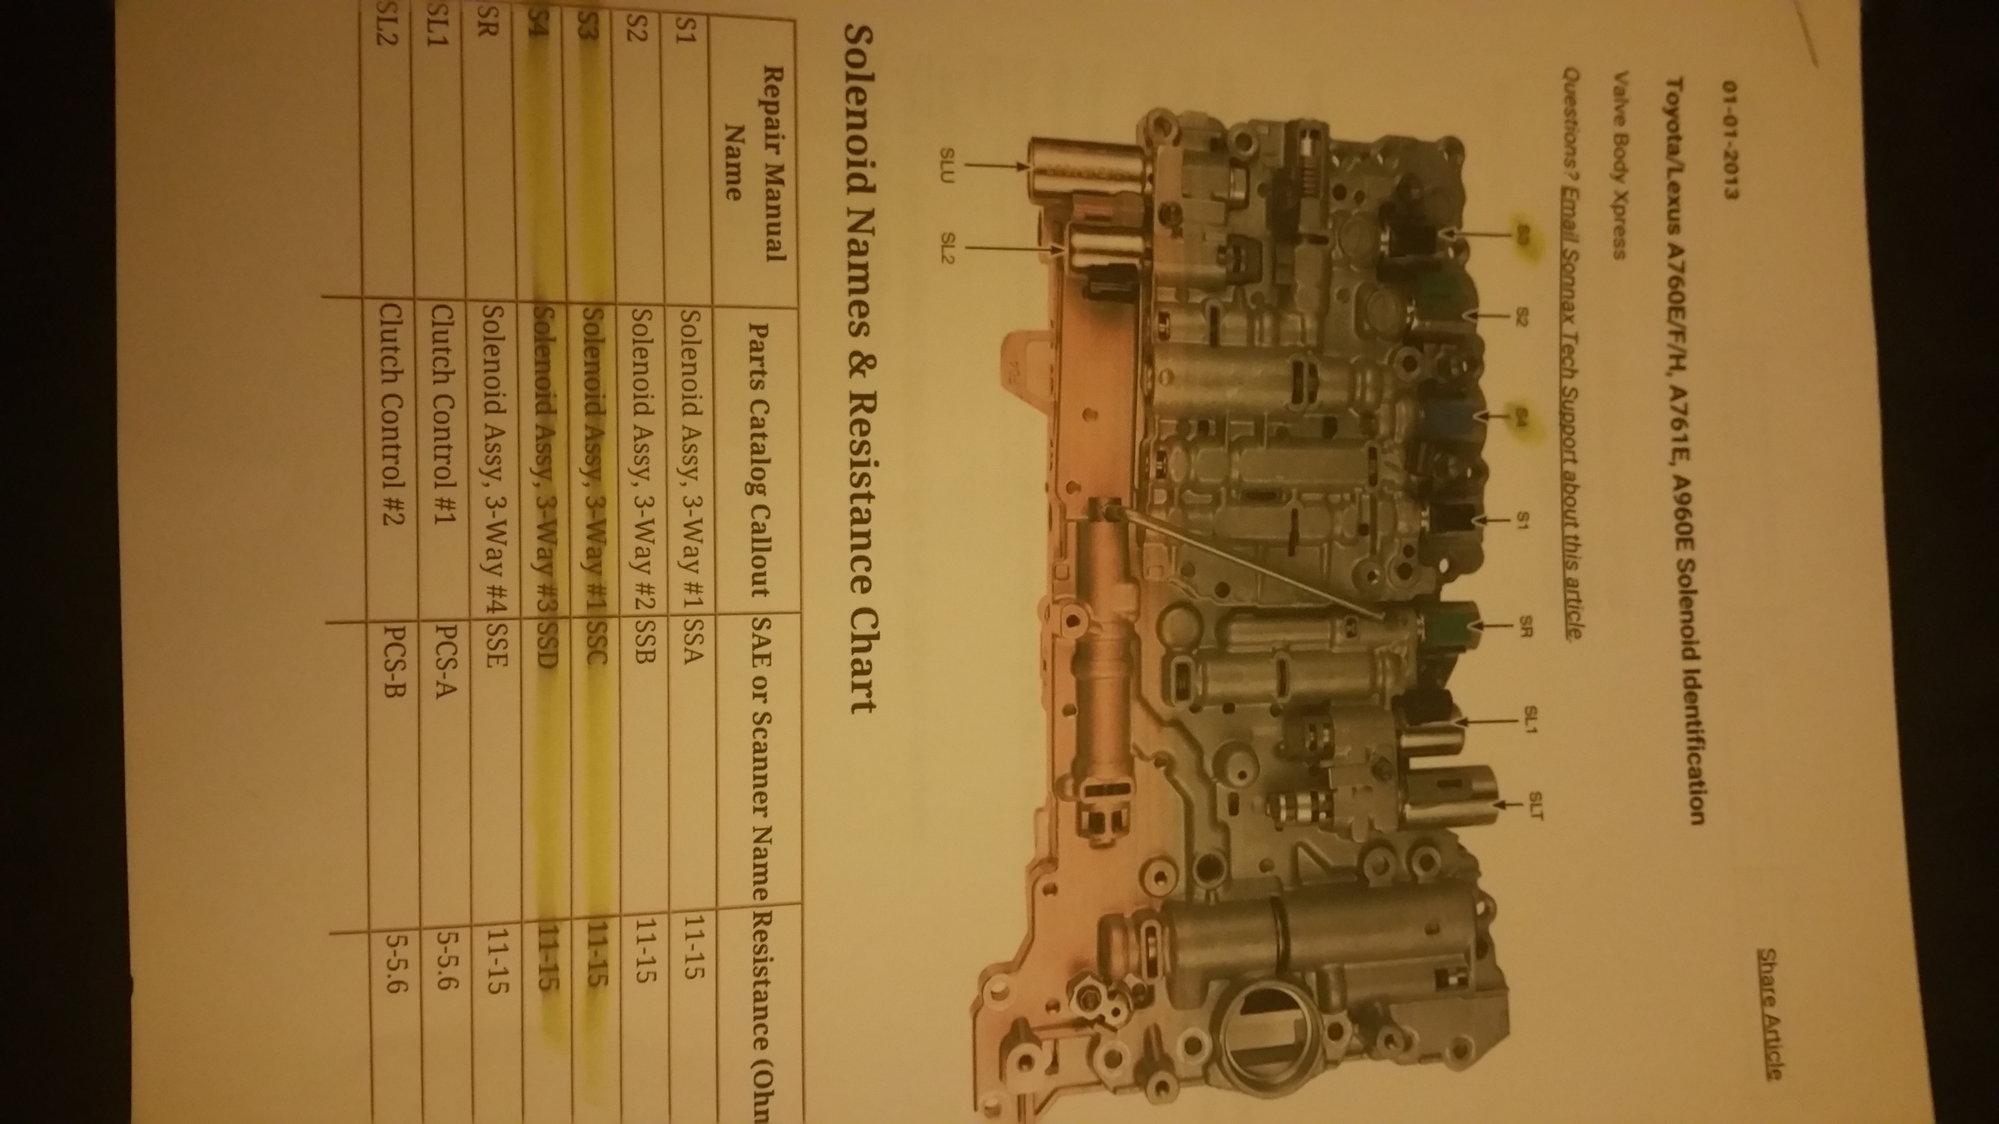 P0763 Shift Solenoid Fixed   - Page 8 - ClubLexus - Lexus